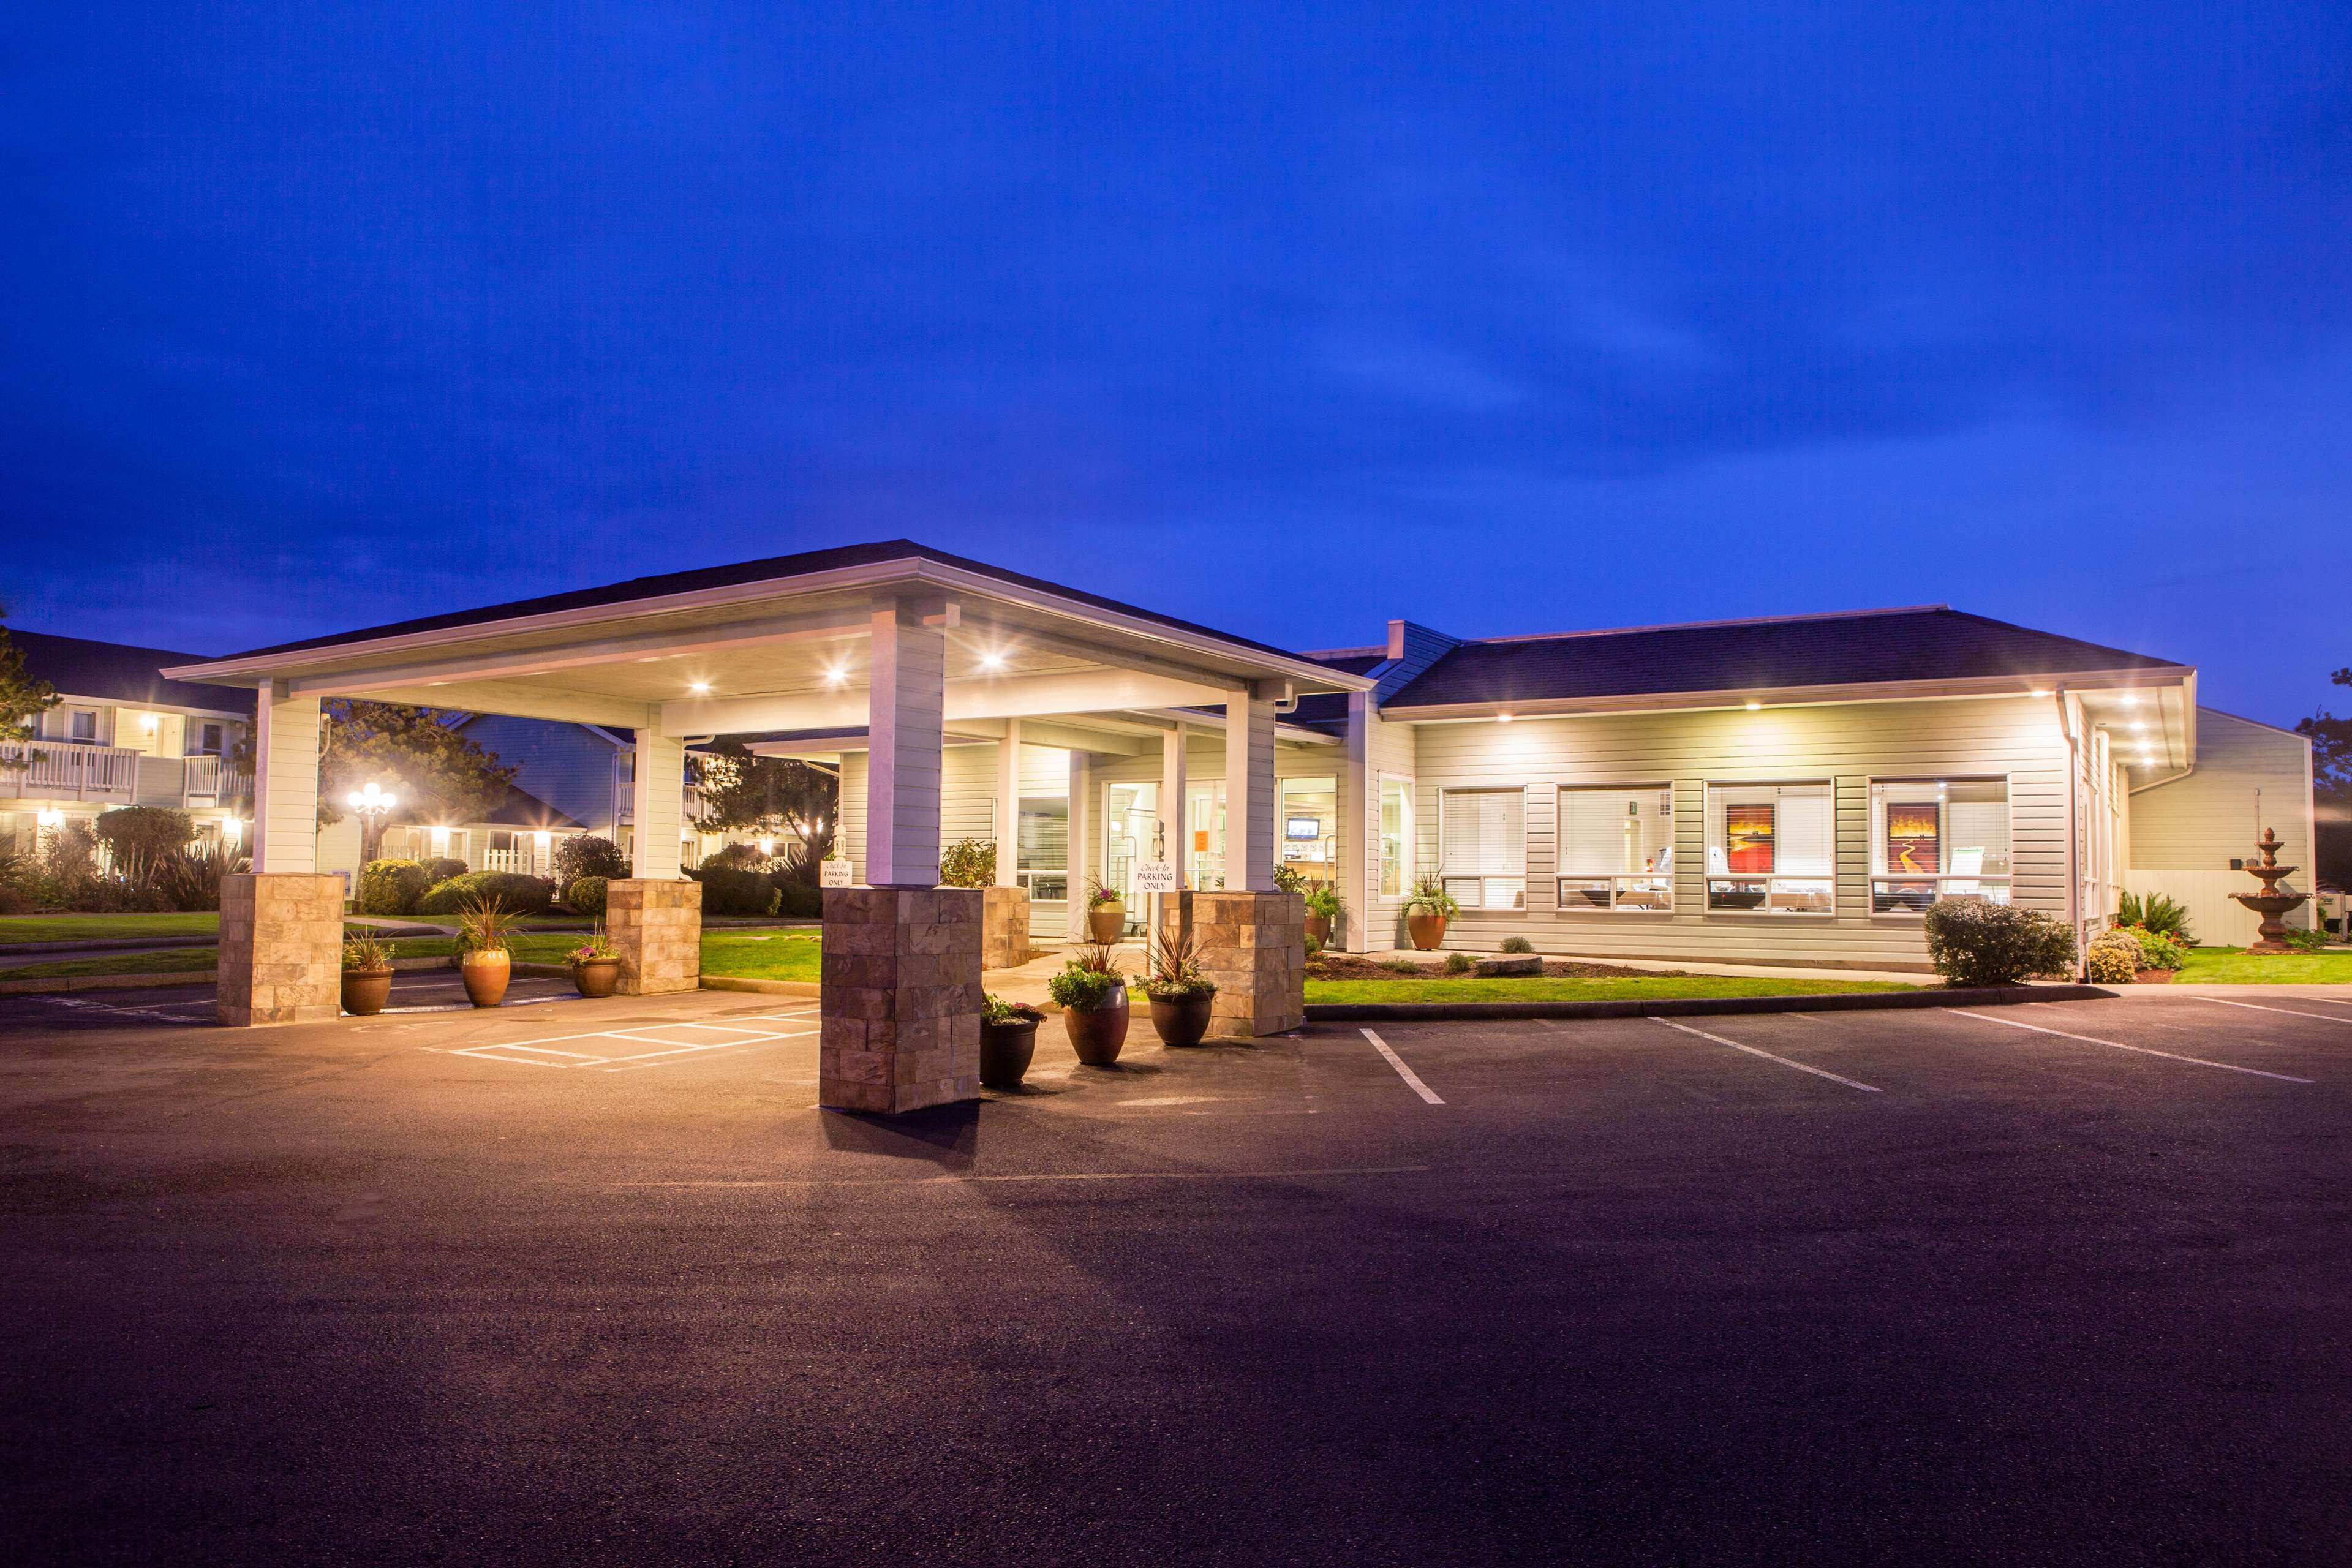 Bandon Inn Motel